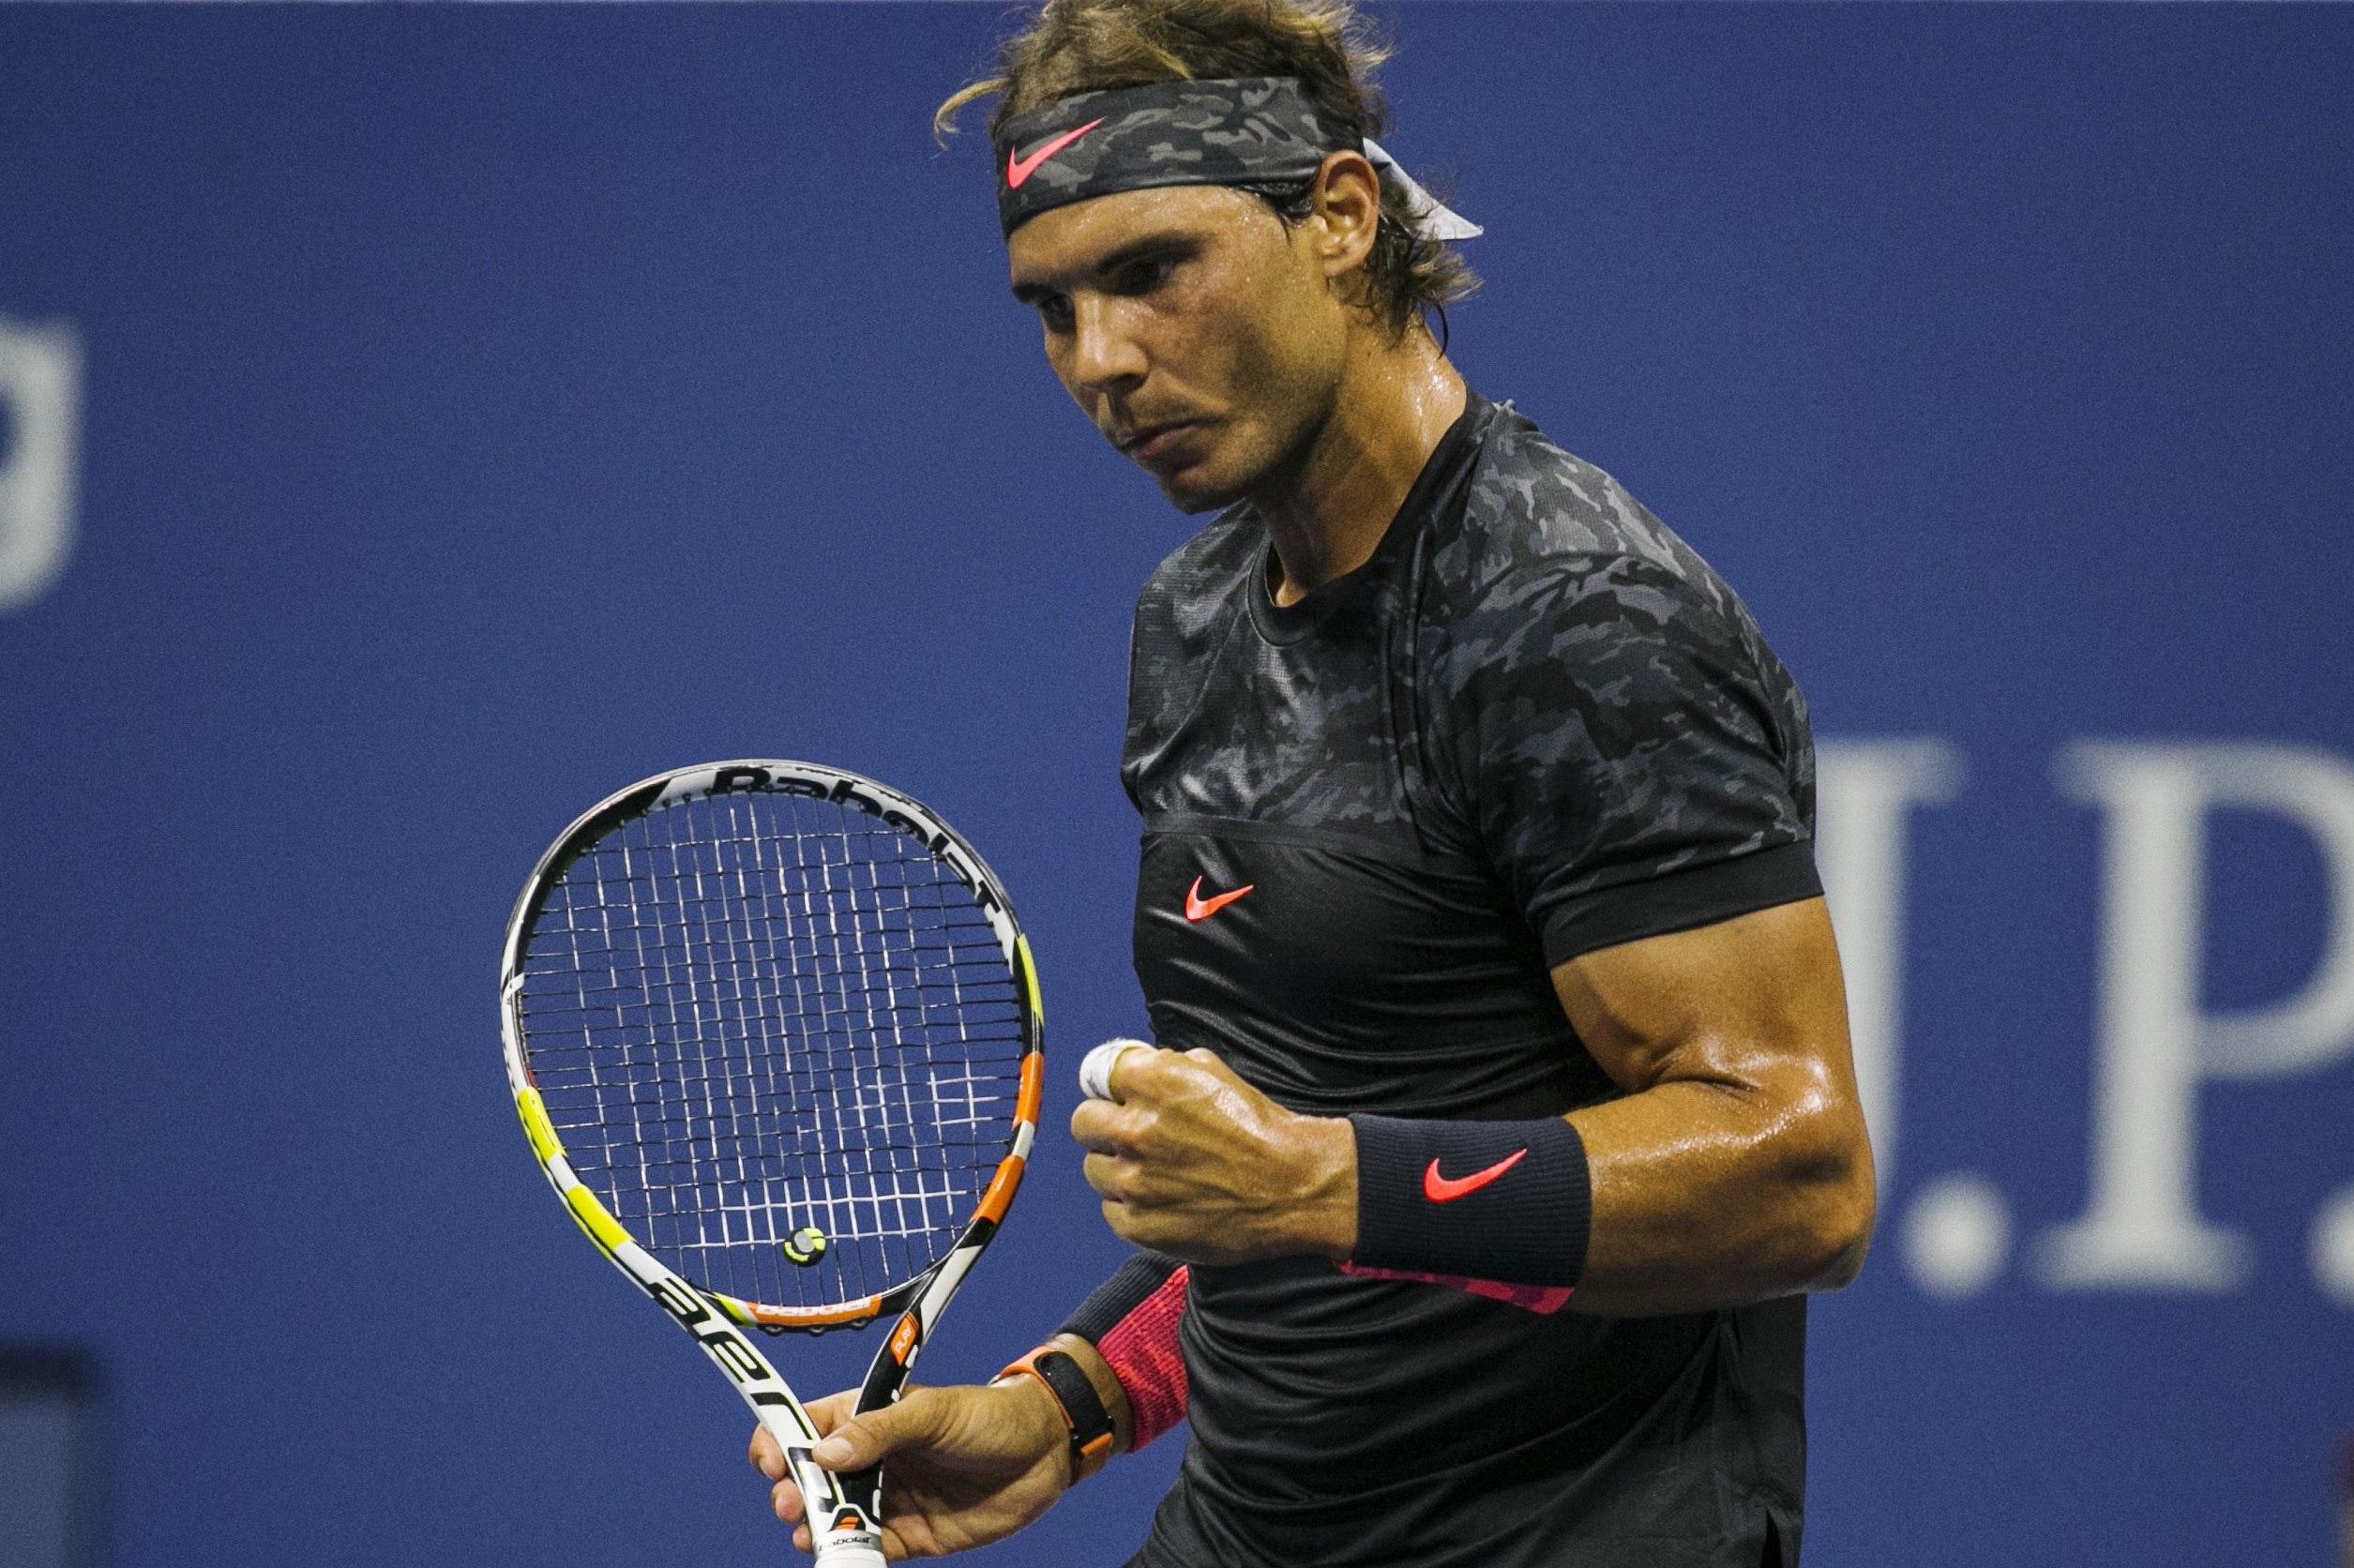 PHOTOS Rafael Nadal Beats Borna Coric To Move Into US